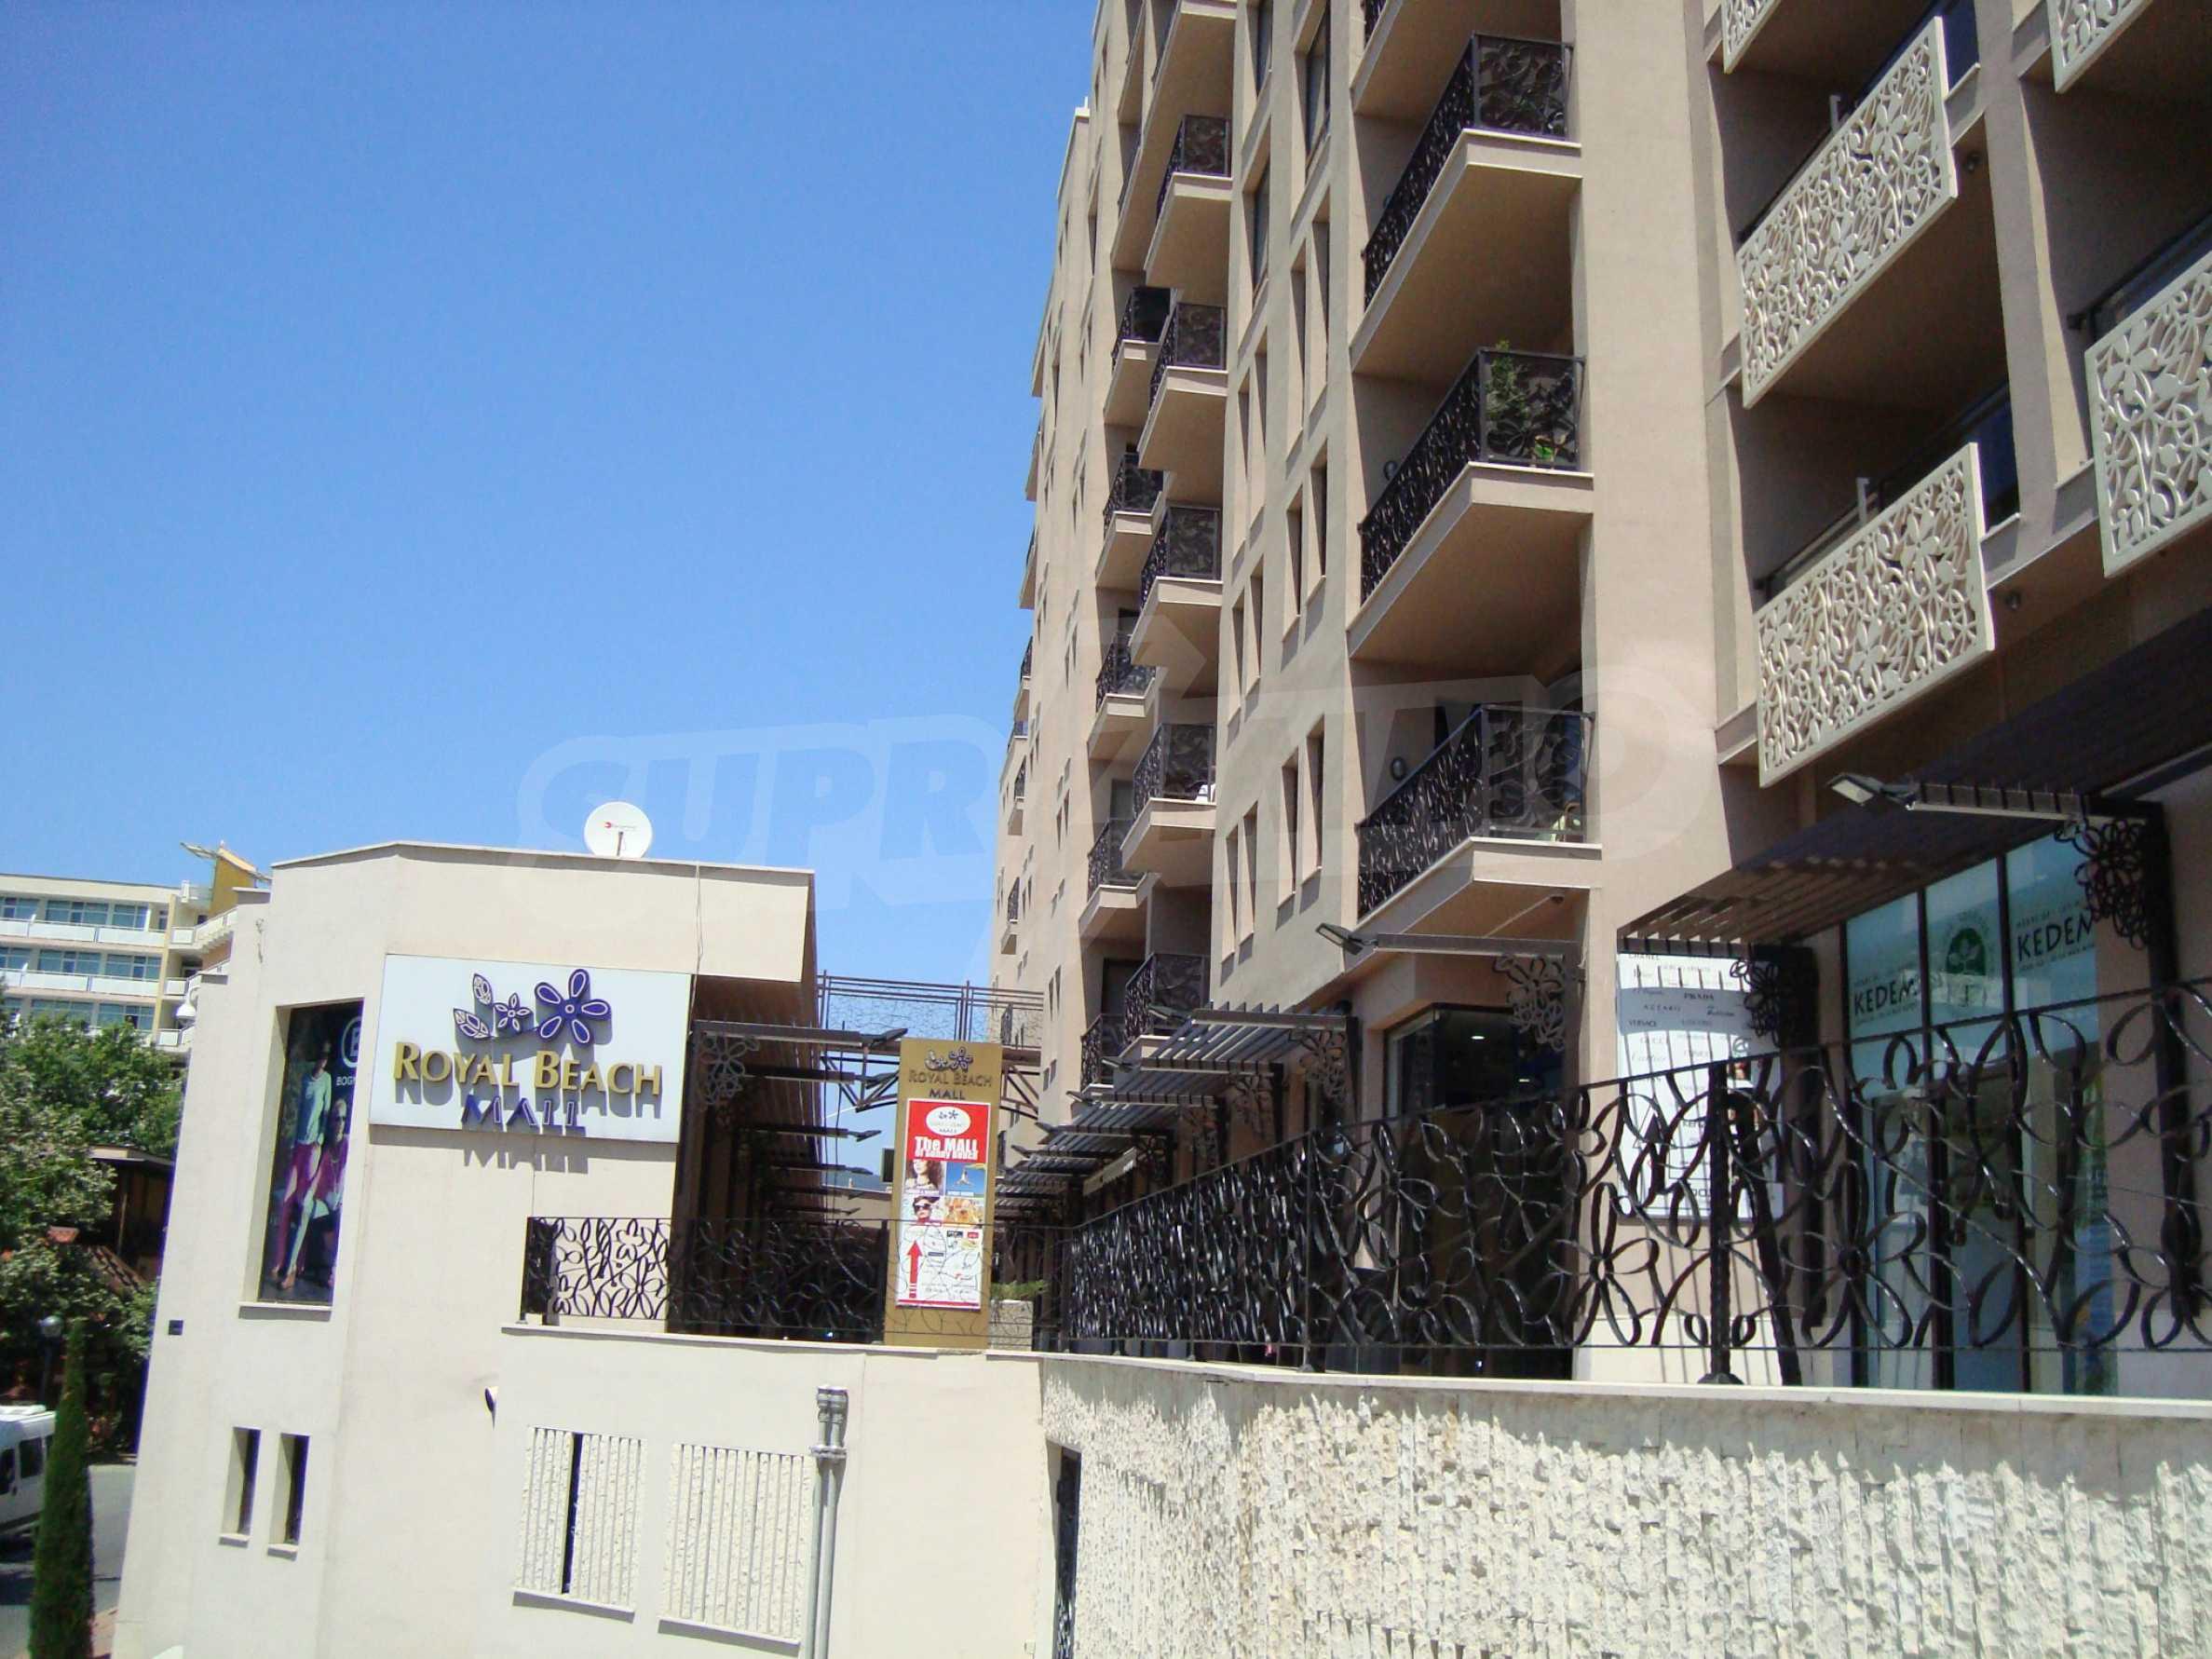 Studio for sale in Royal Baech Barcelo in Sunny Beach 24